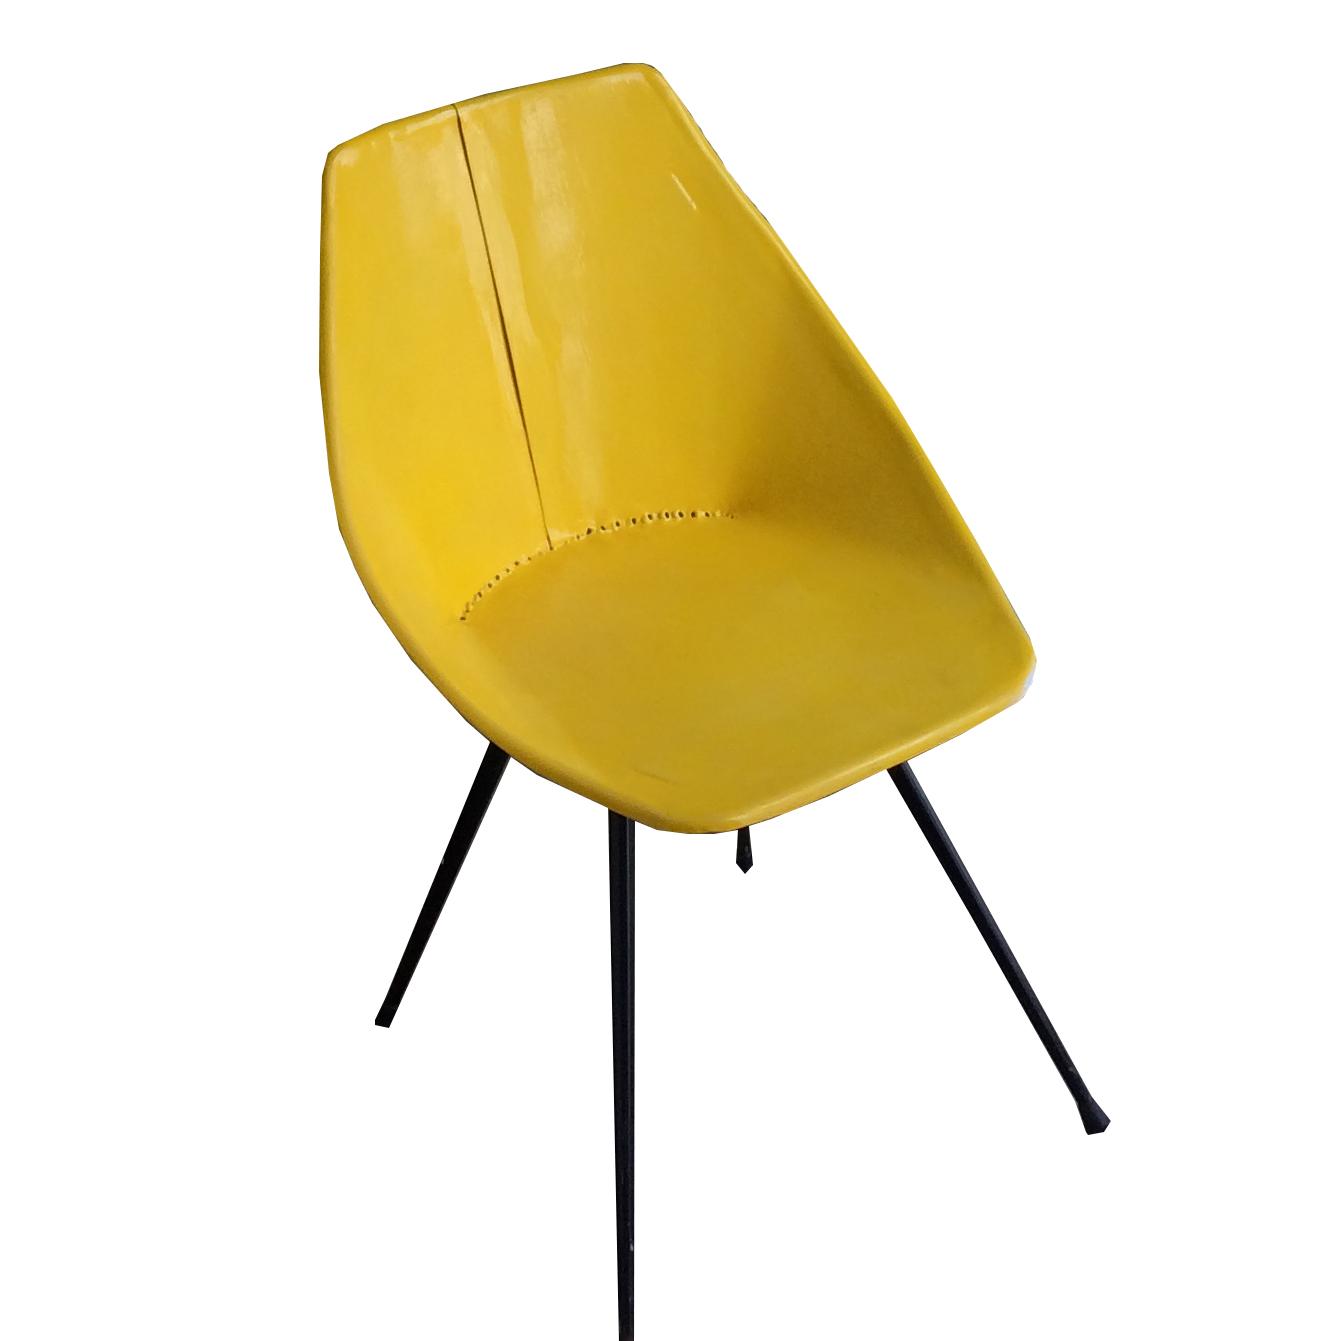 Metall Stuhl gelb -